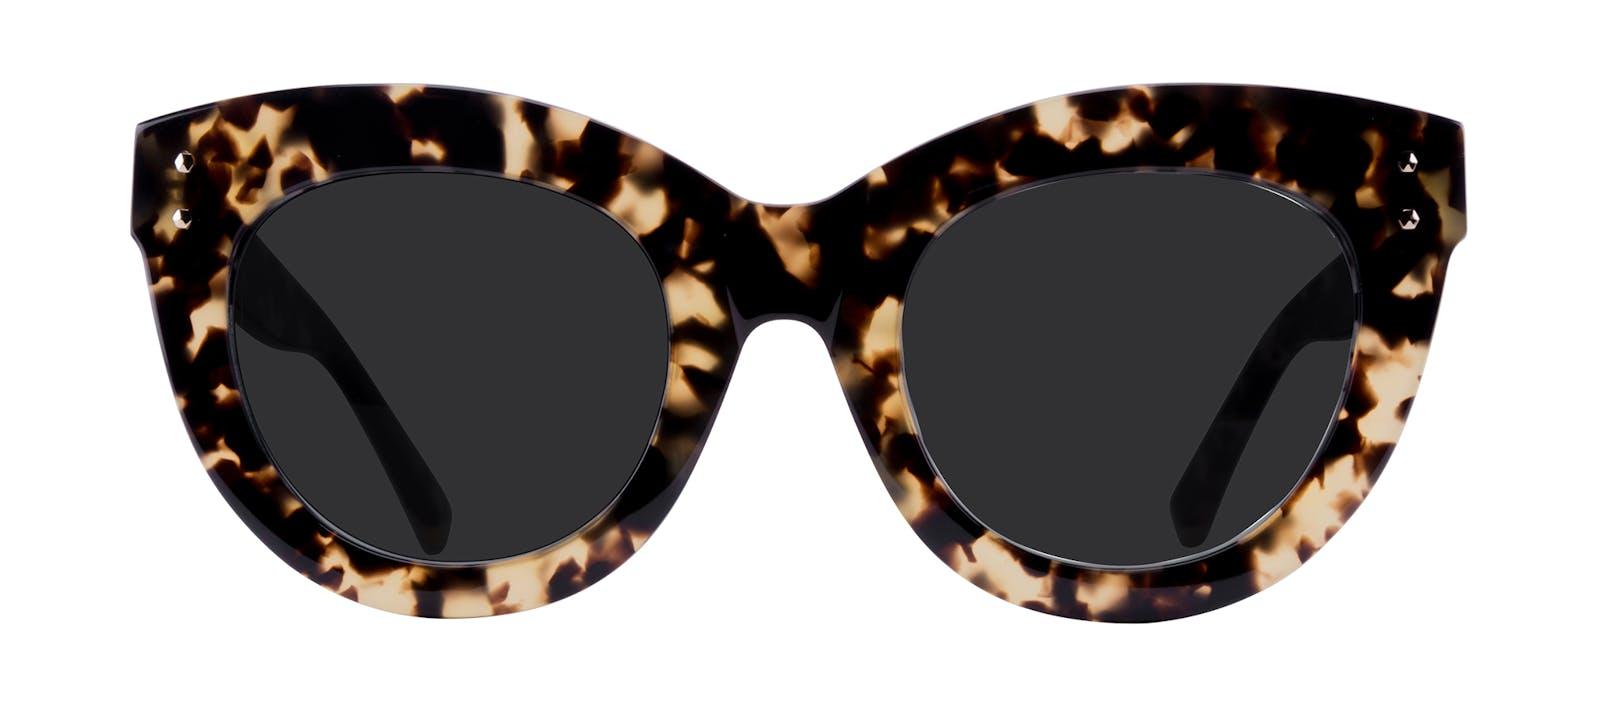 77902436a6 Affordable Fashion Glasses Cat Eye Sunglasses Women Dusk Tortoise Front